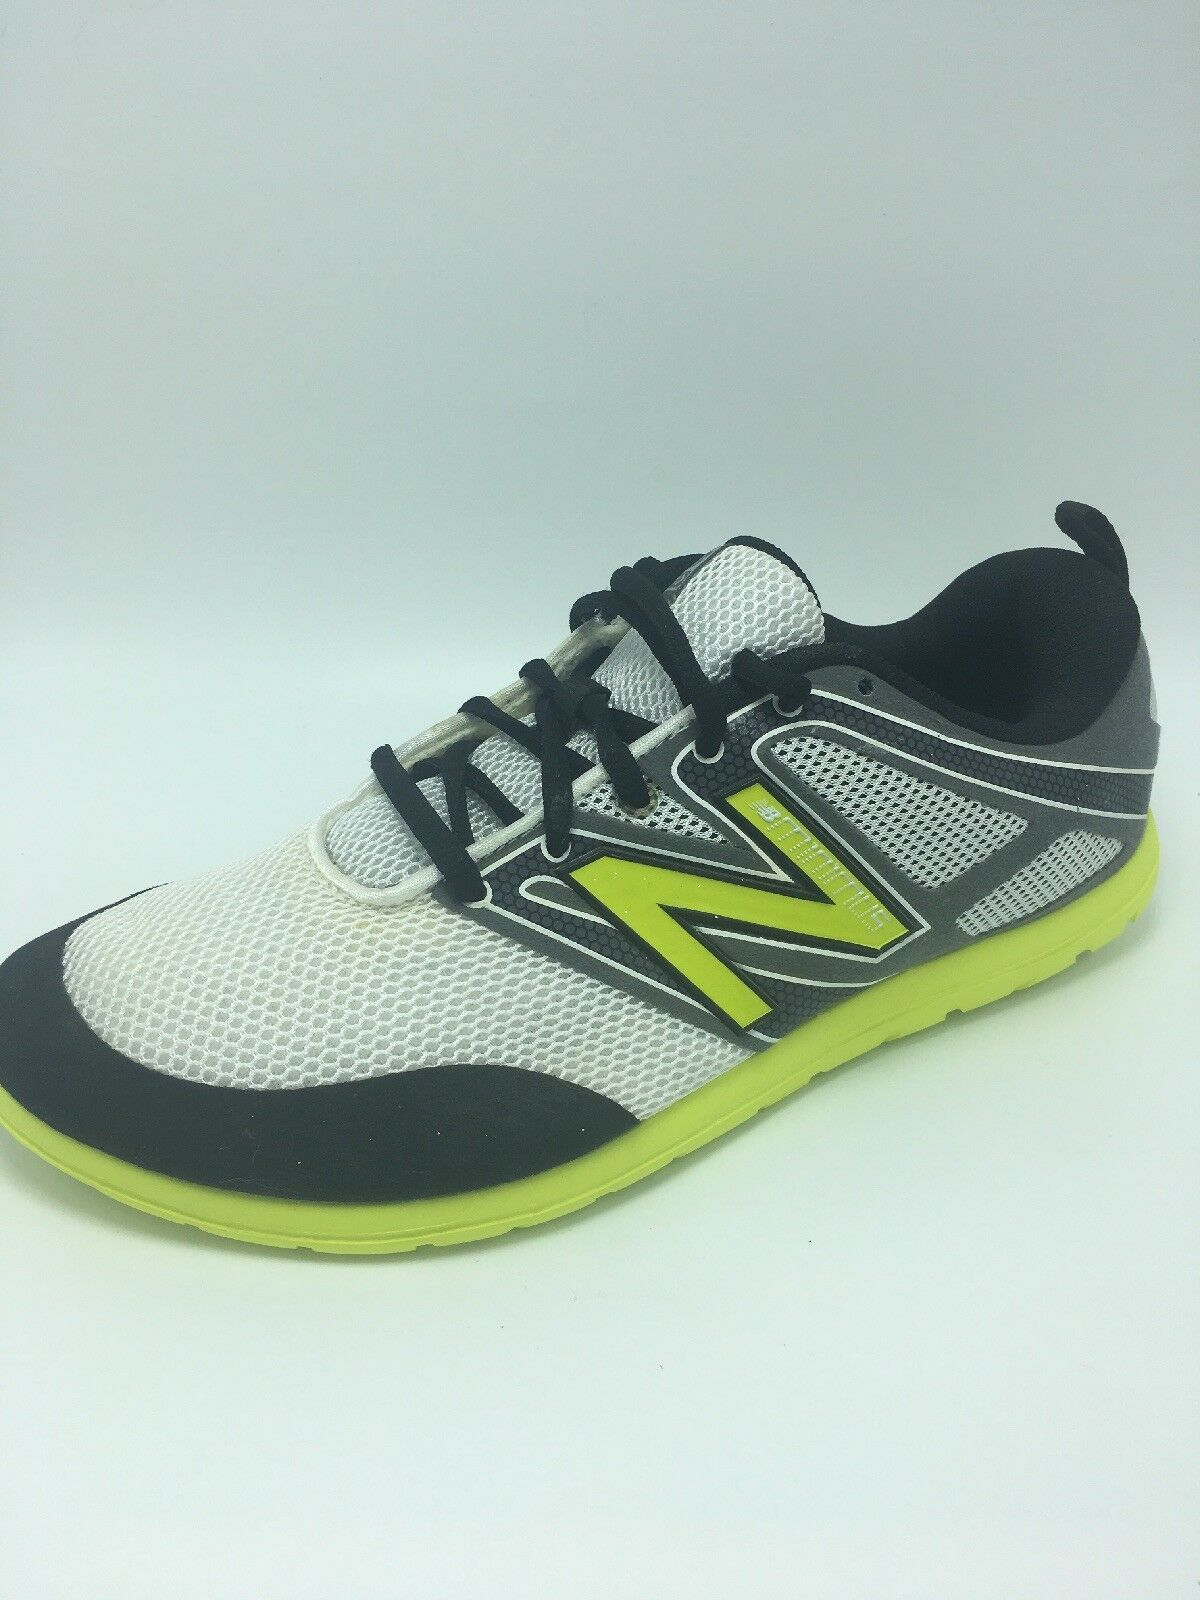 New Balance Men's Minimus Training Sneaker Black White Yellow 7 1 2, 7.5